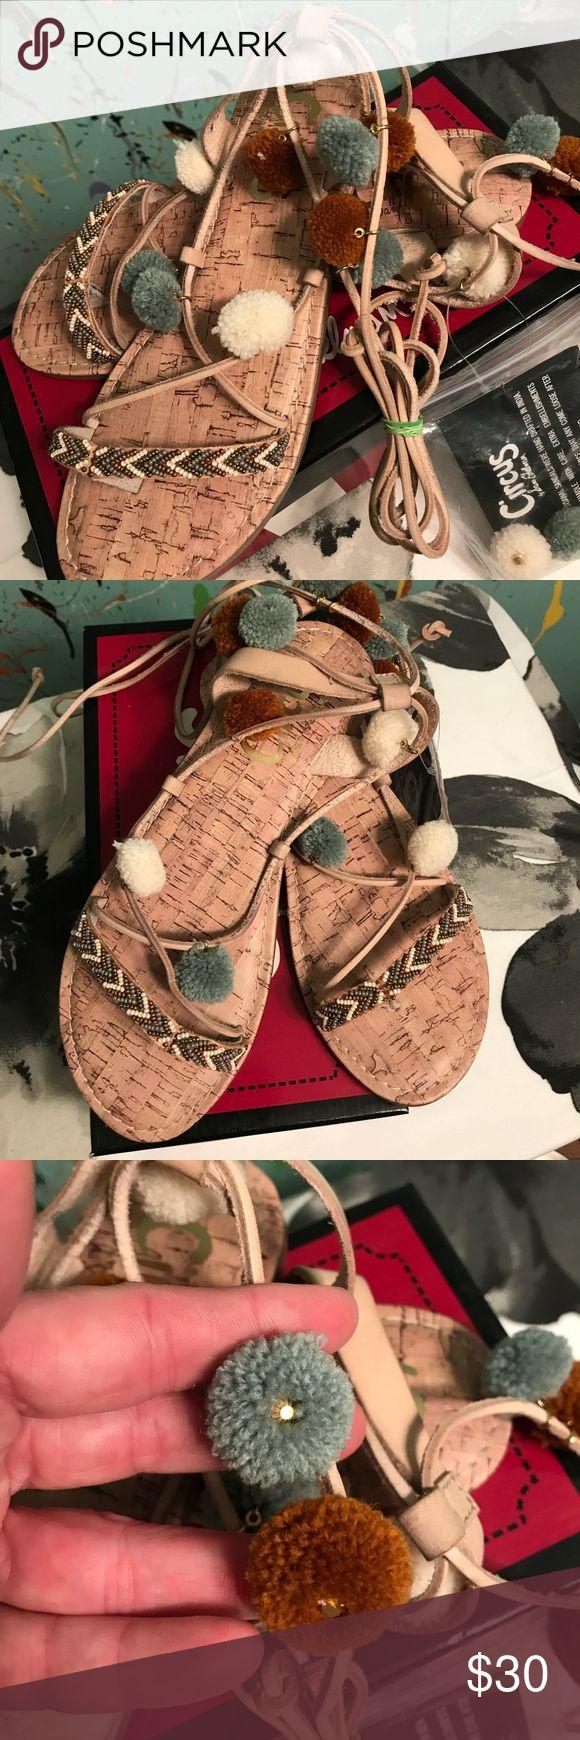 🌵CIRCUS by Sam Edelman🌵Valencia Ankle Tie Sandal 🌵Flat thong sandal 🌵pom accents & beaded detailing 🌵Cute ankle ties 🌵Fun boho flair      ⭐️NIB⭐️ Circus by Sam Edelman Shoes Sandals